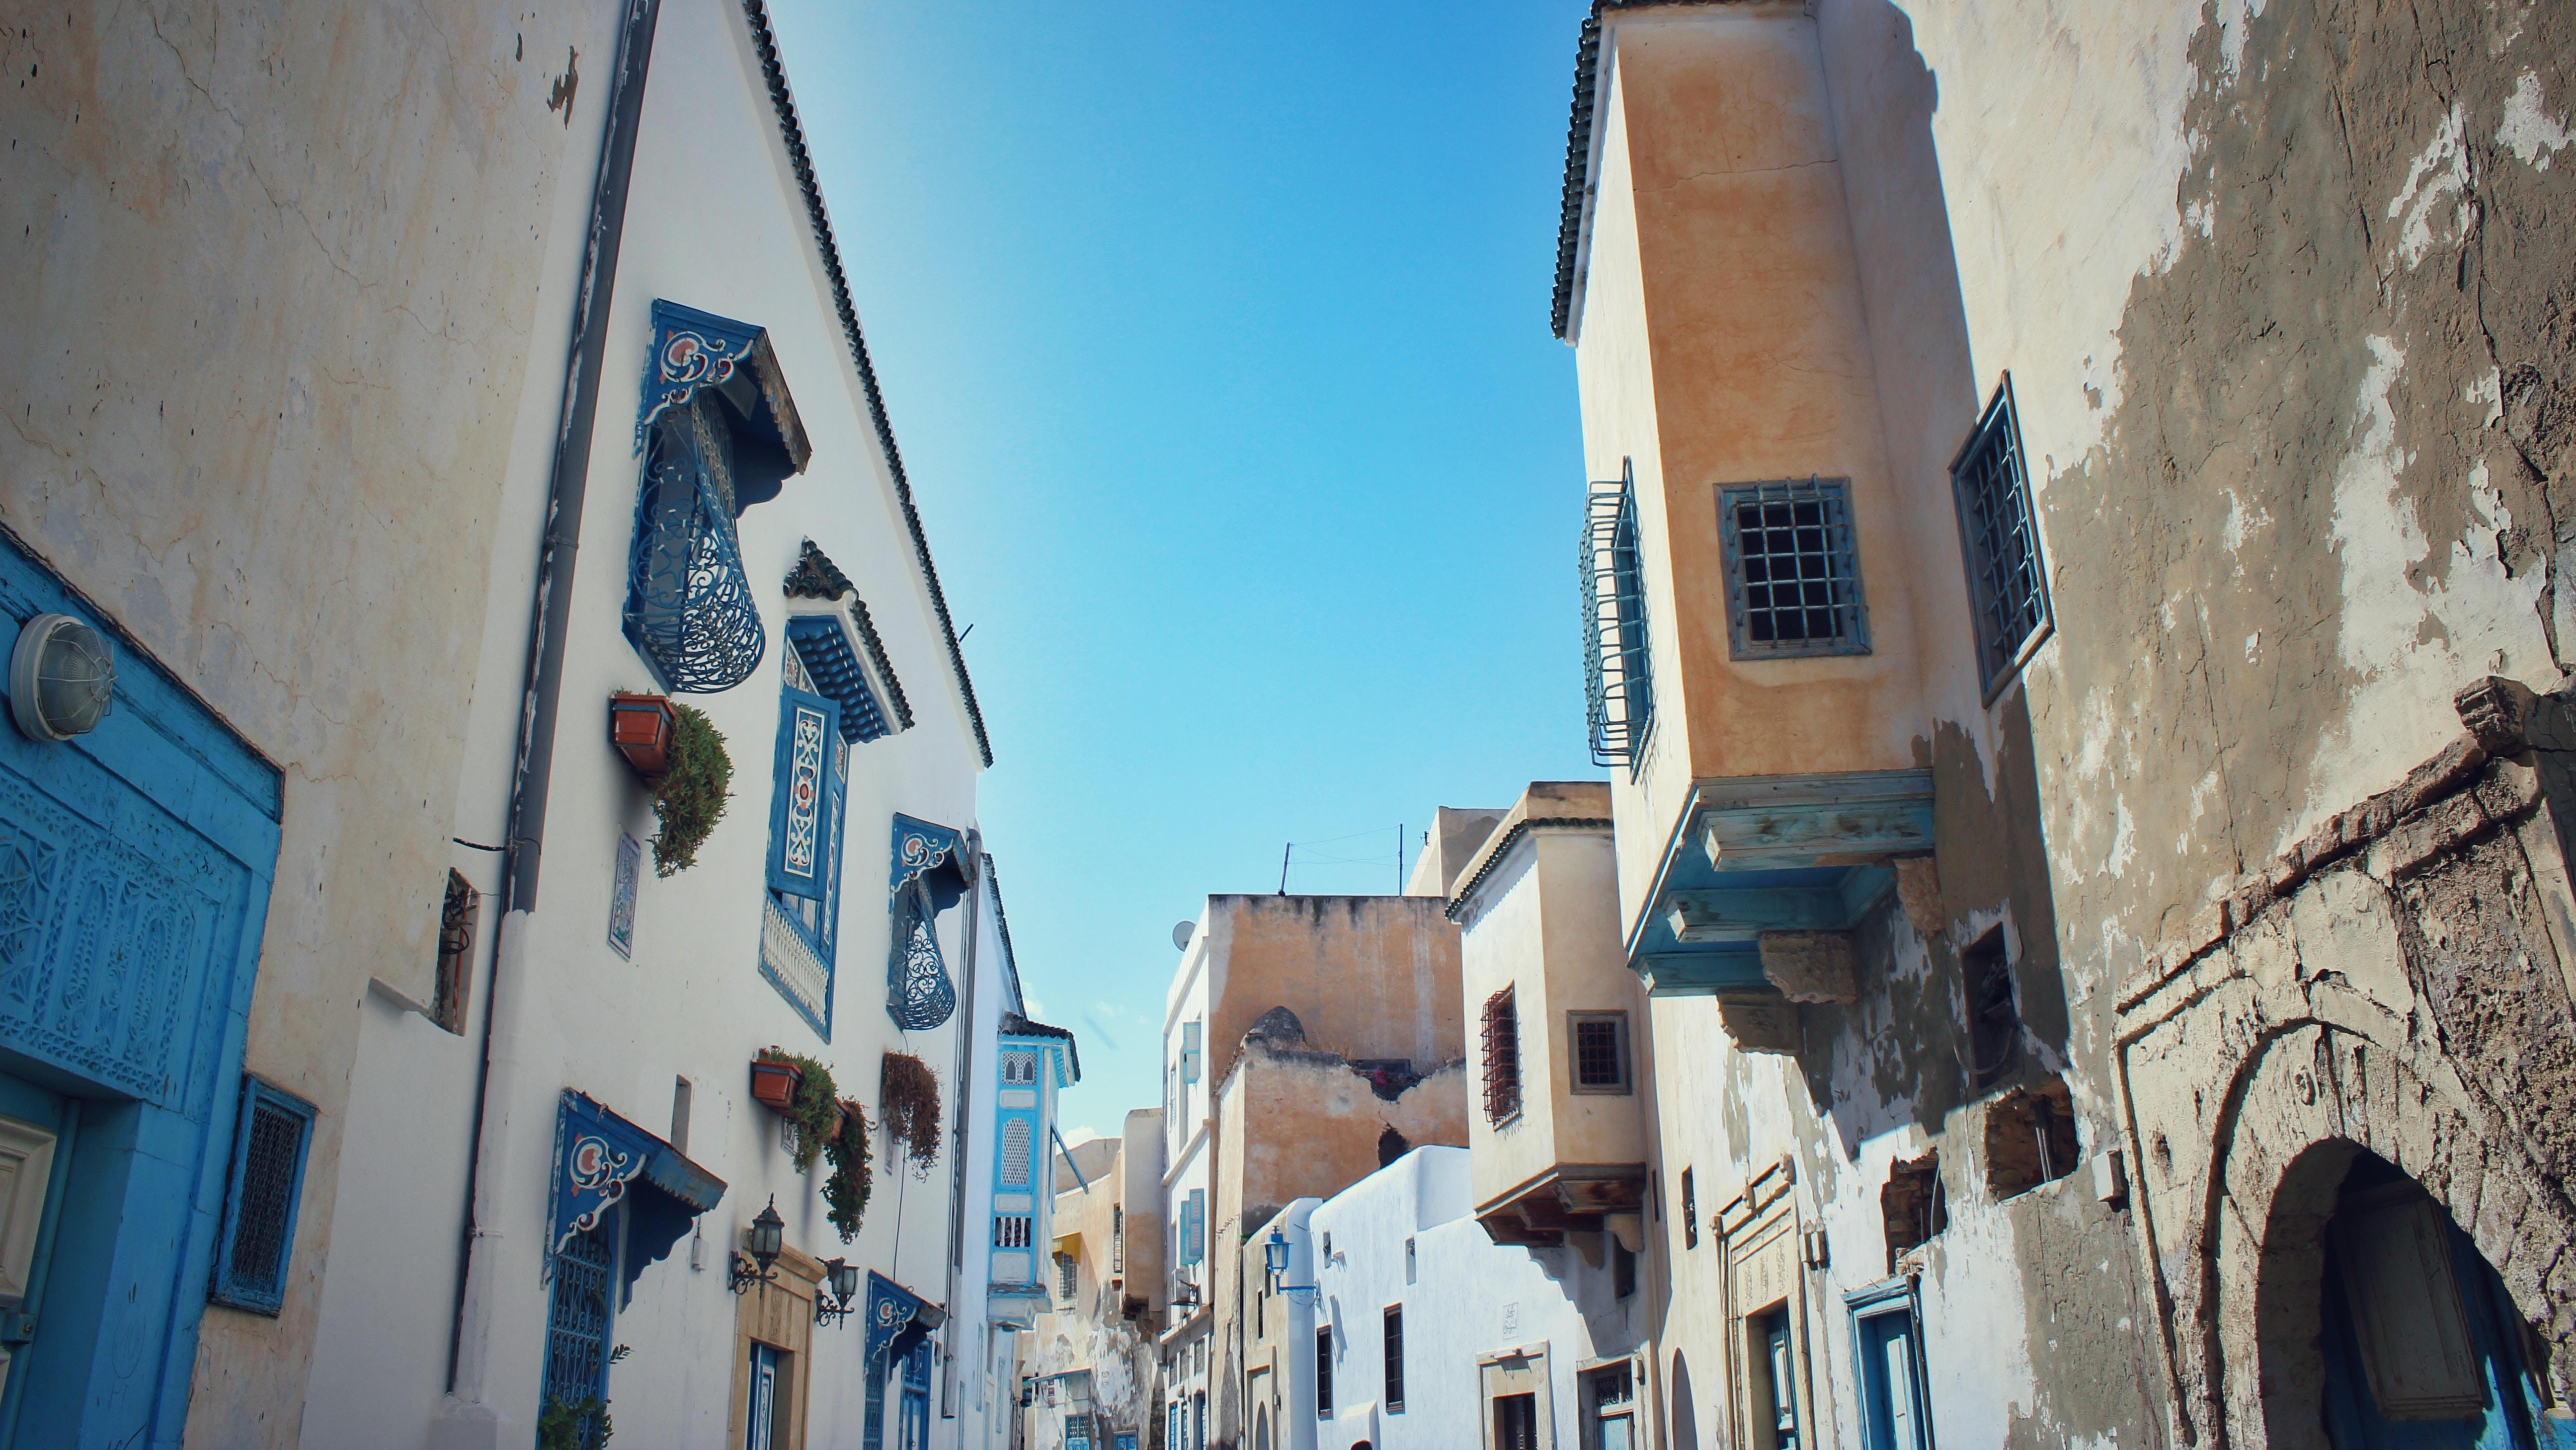 houses under blue sky